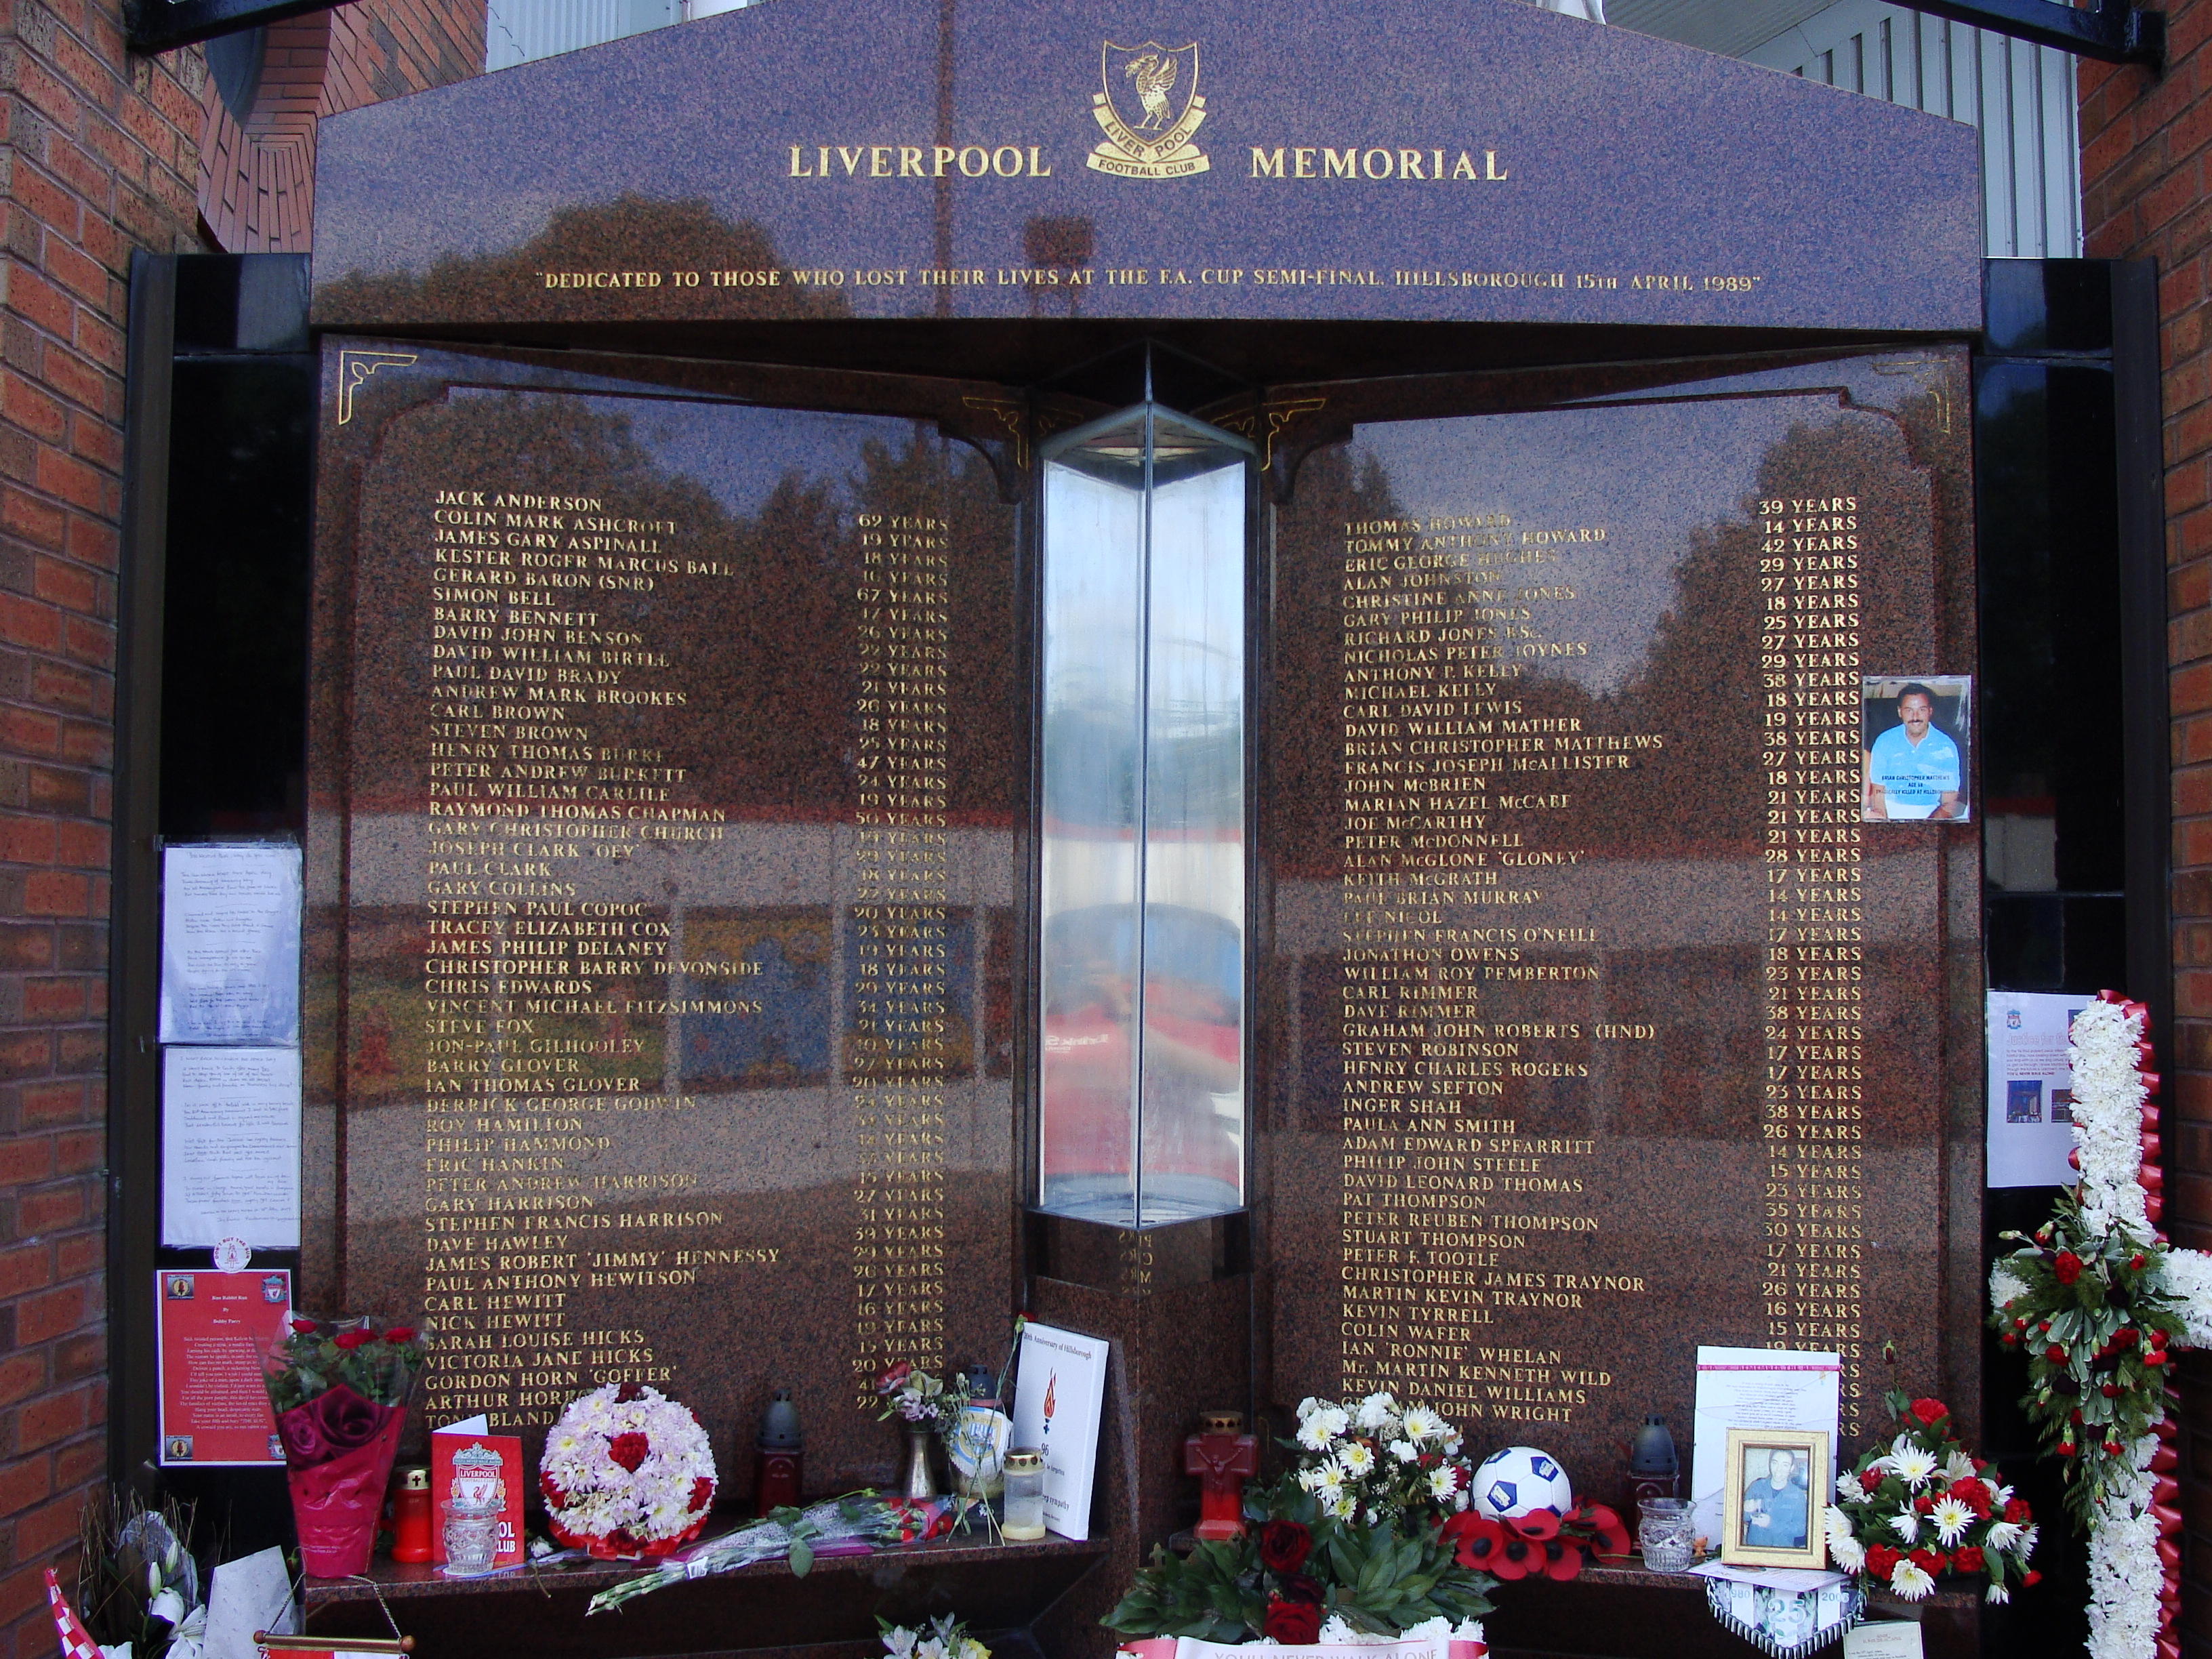 The_Hillsborough_memorial.jpg